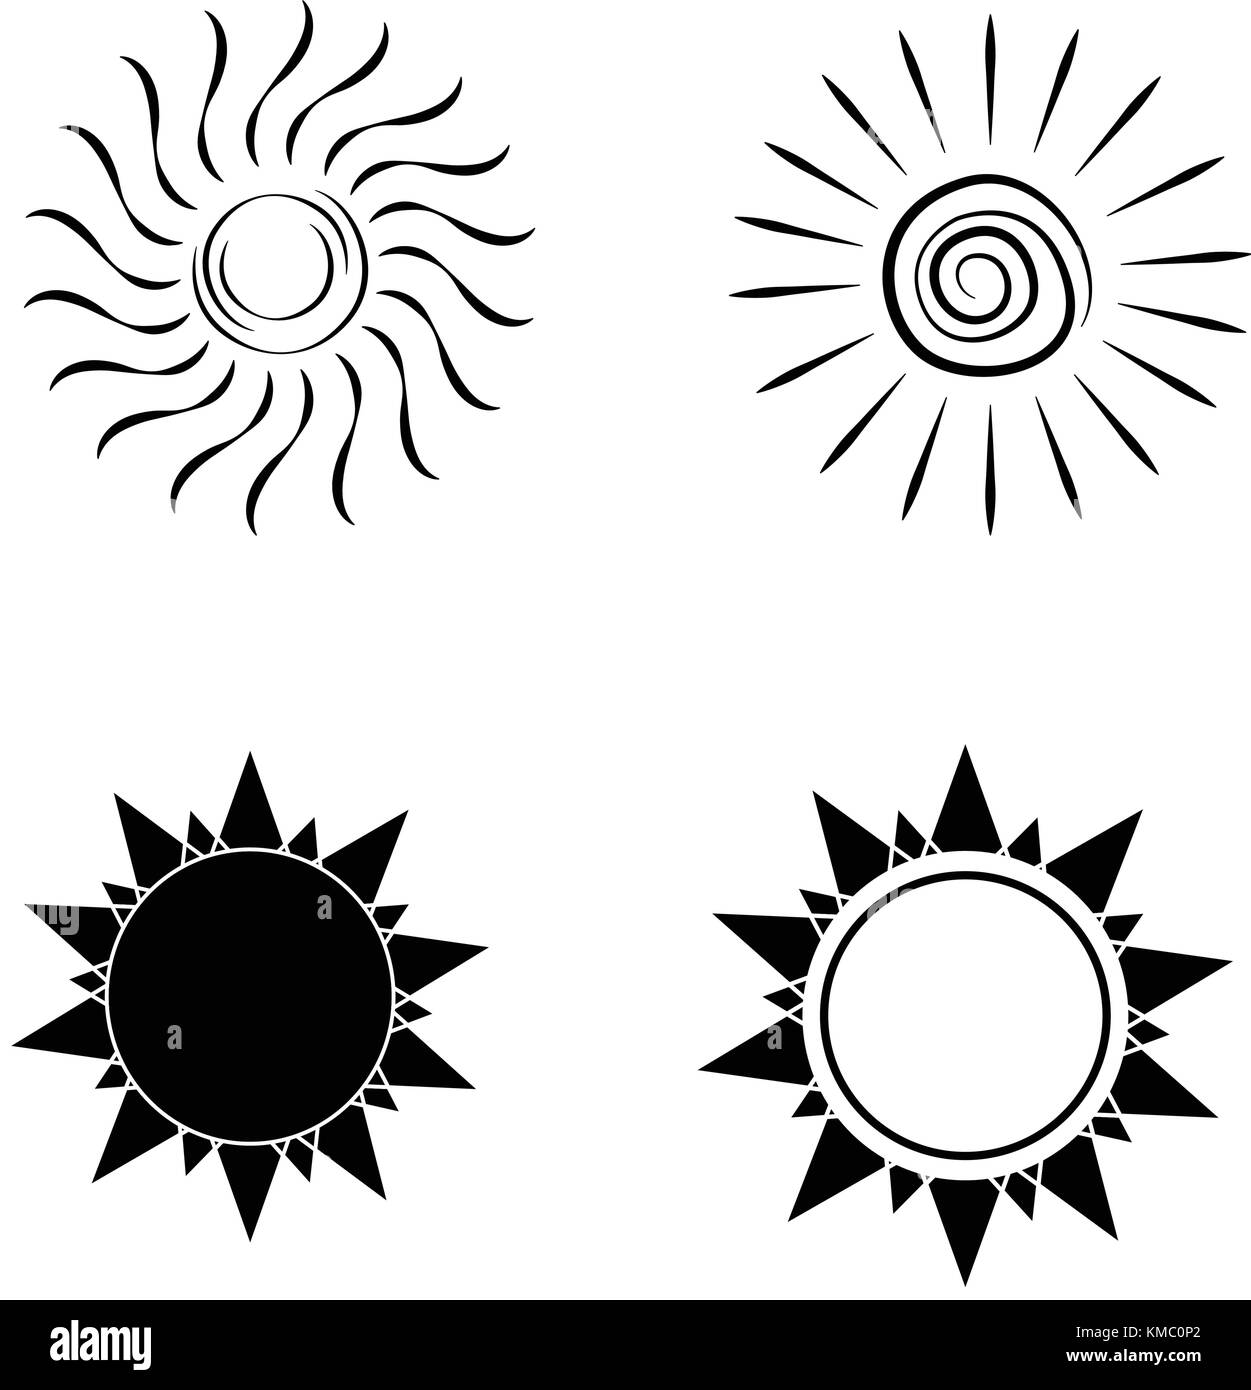 abstract sun shape - Stock Vector